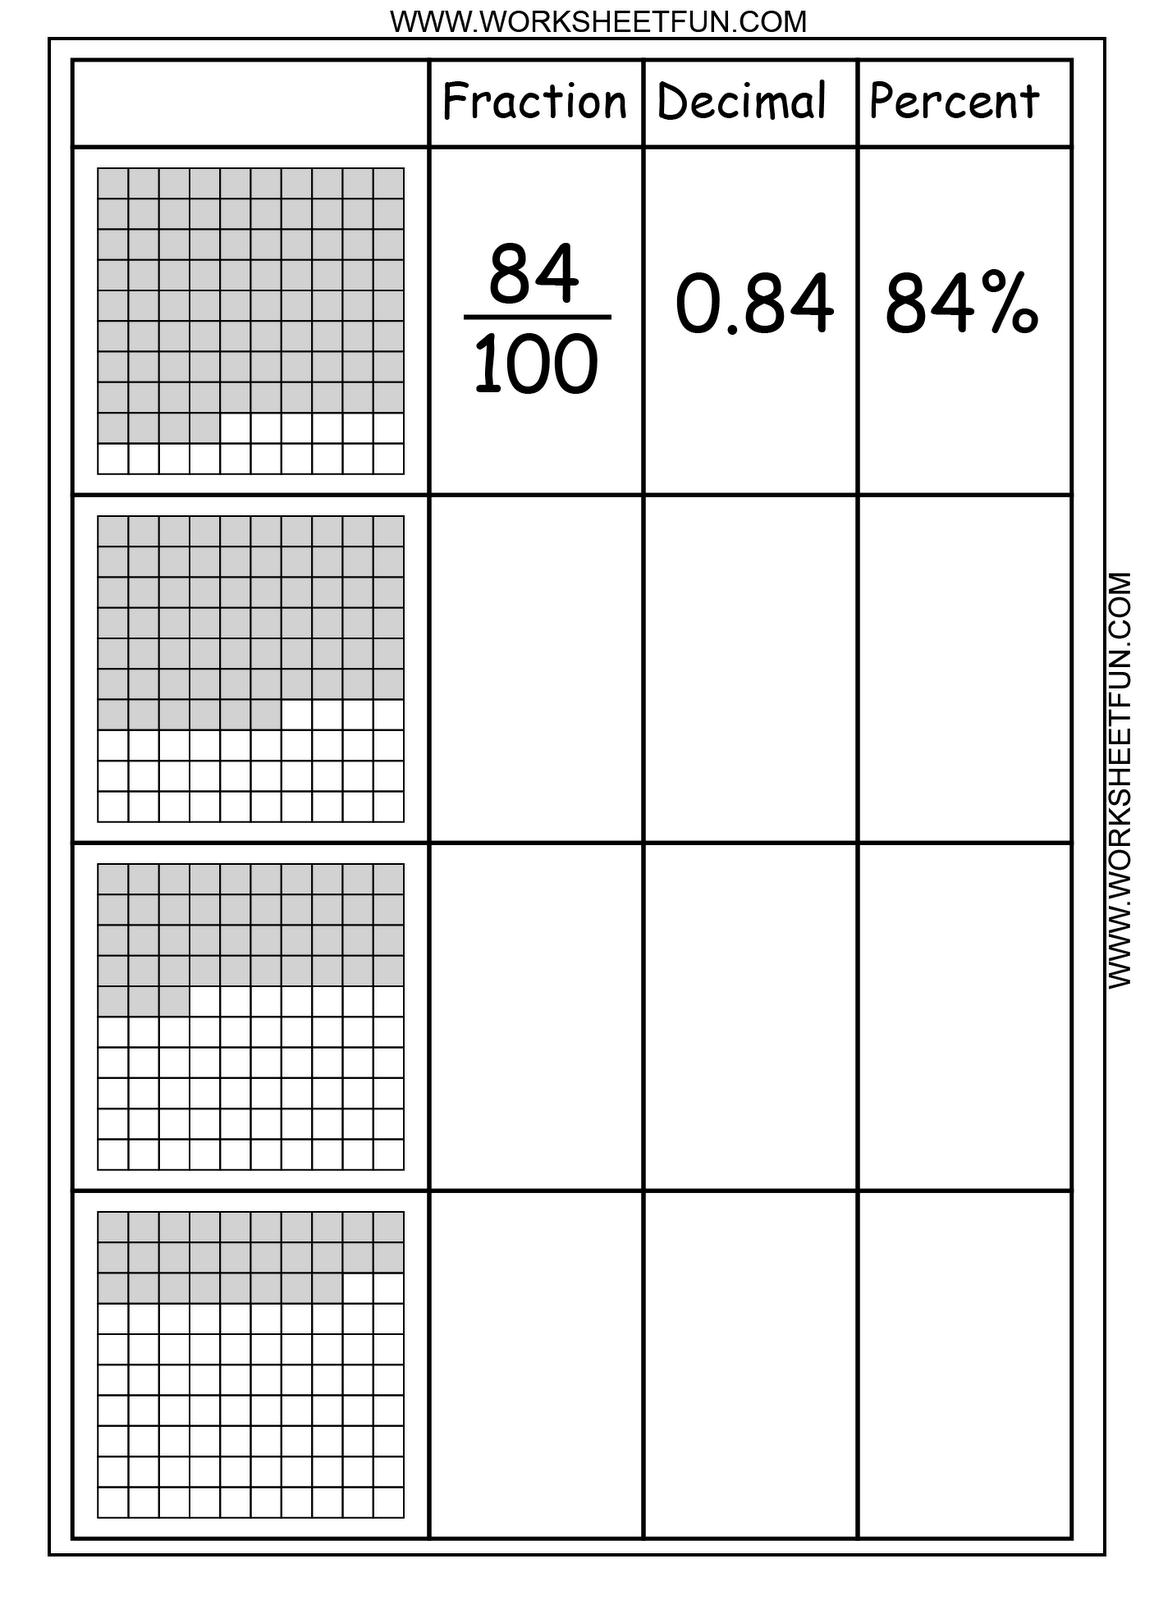 4th Grade Math Worksheets Fractions Decimals Percents – Mreichert Kids  Worksheets